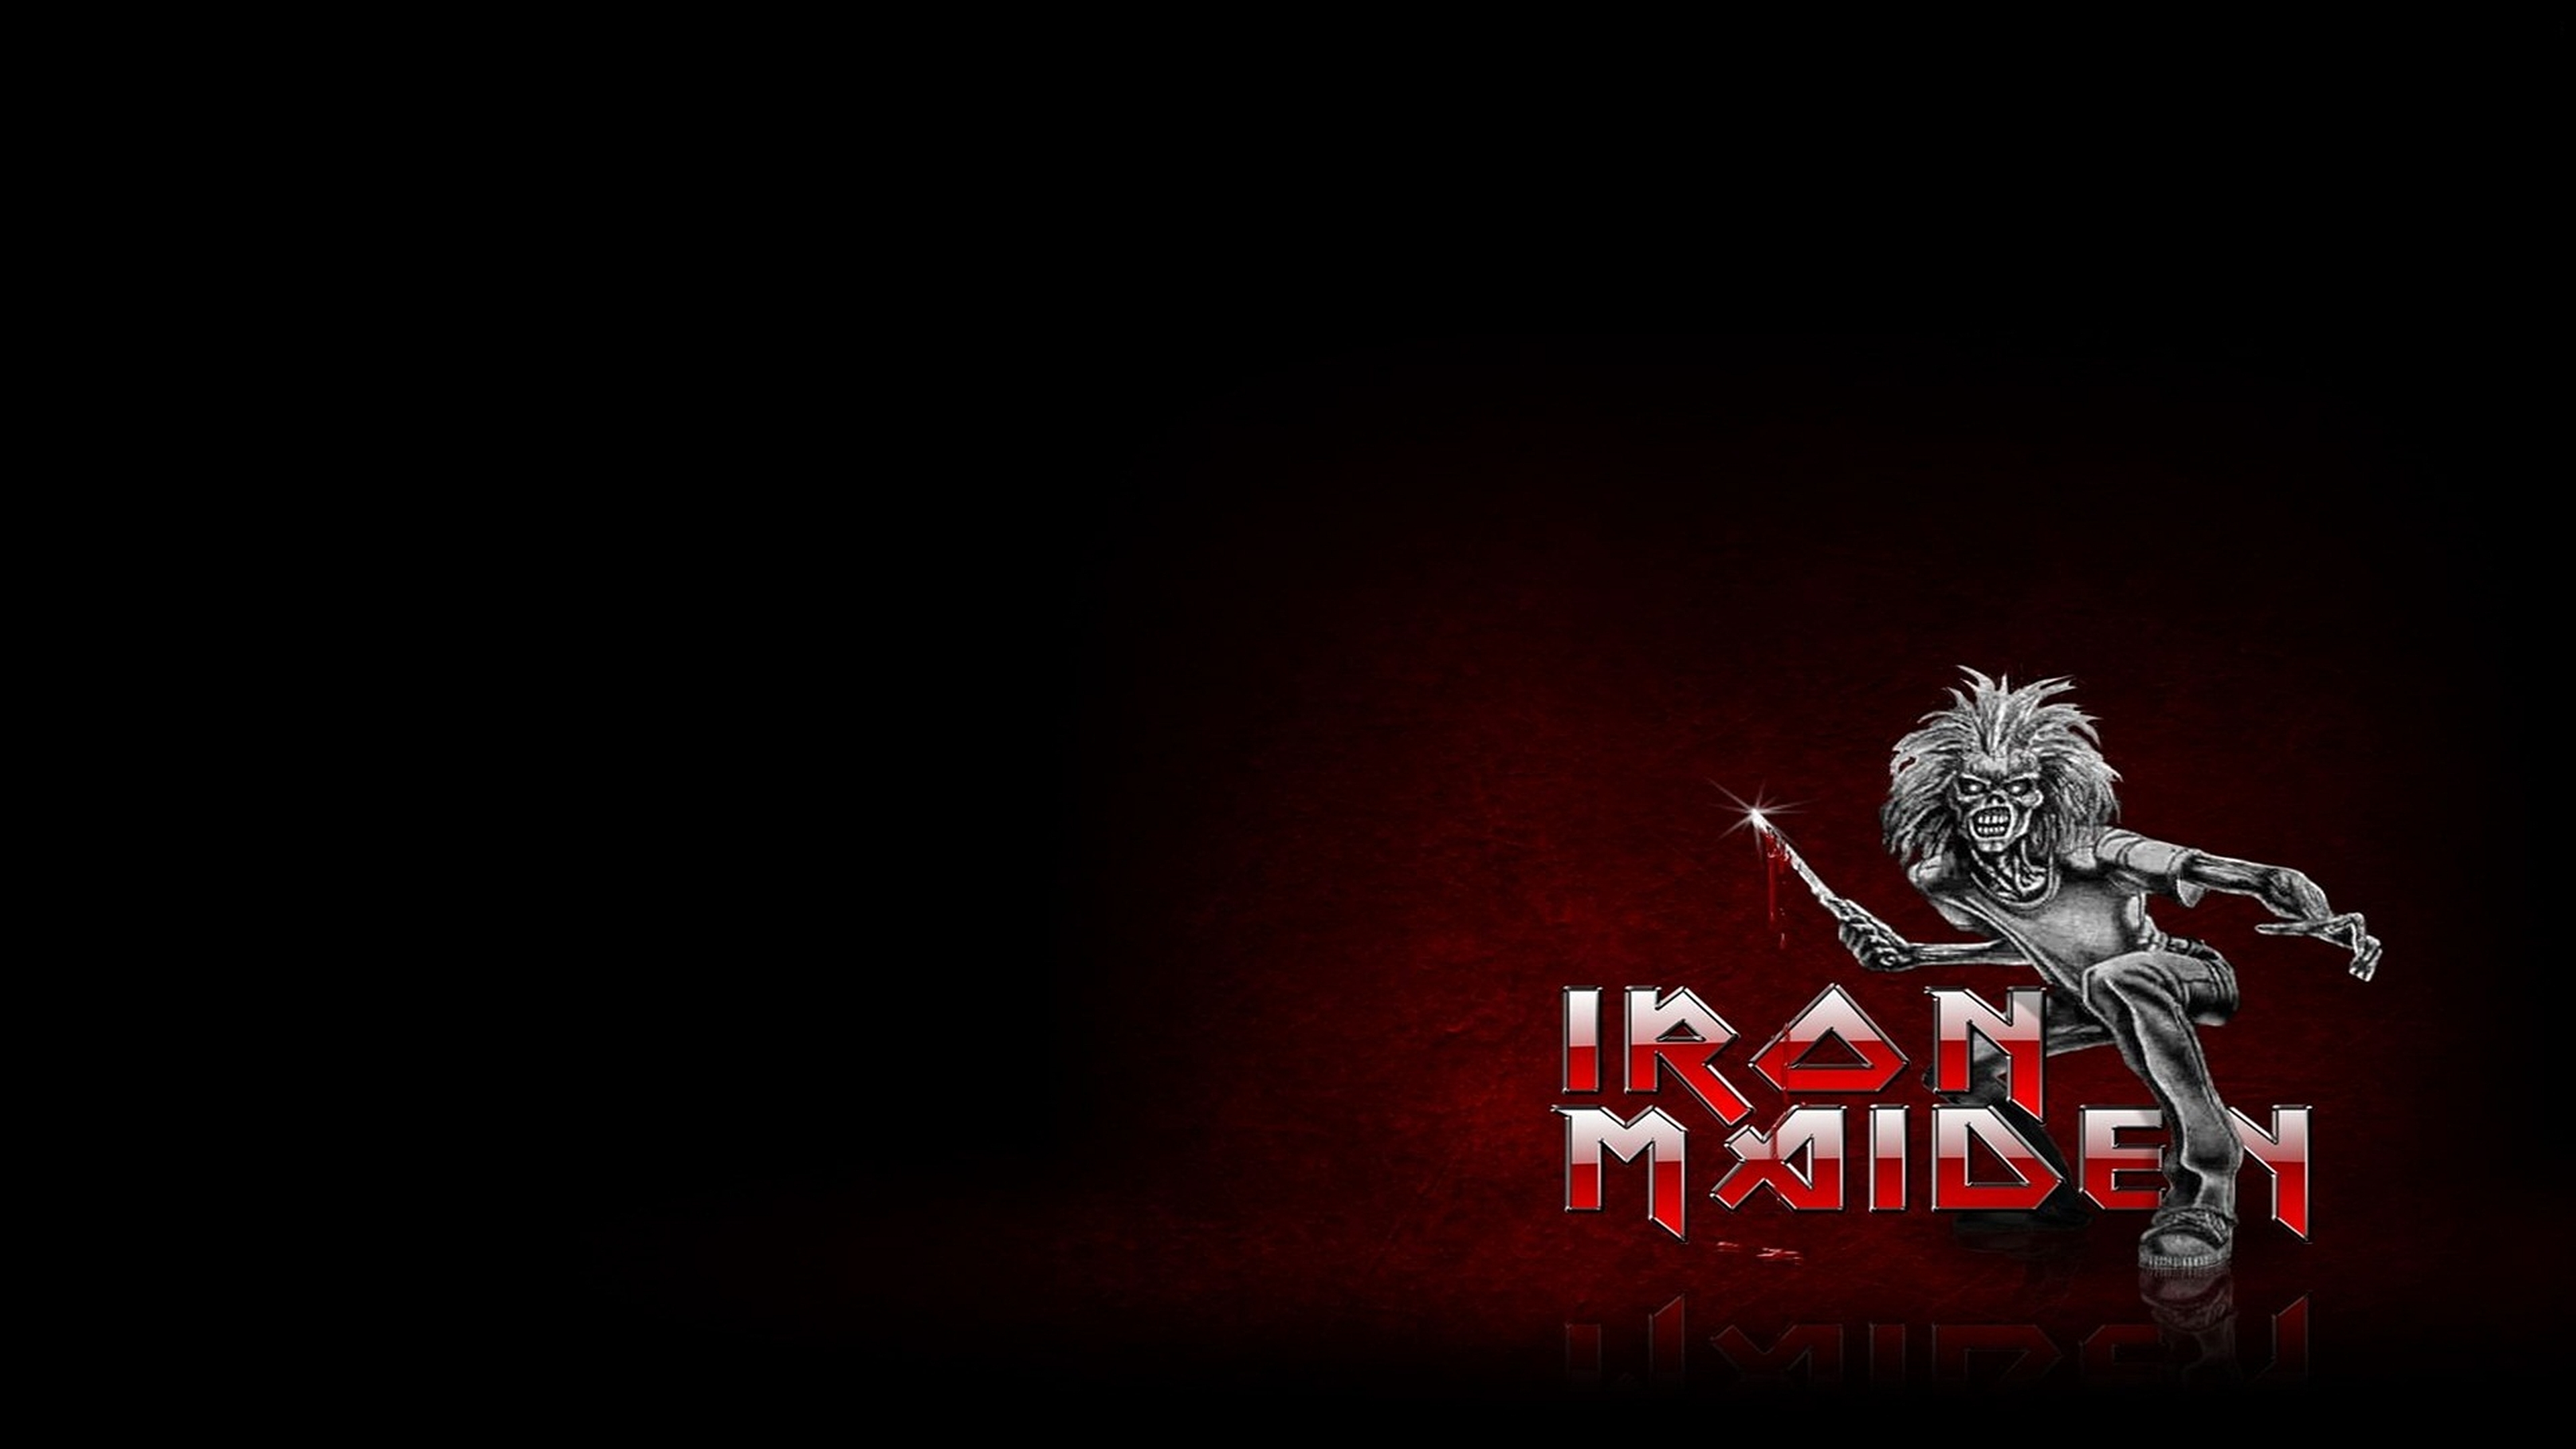 Iron Maiden Desktop Wallpaper: Iron Maiden Backgrounds